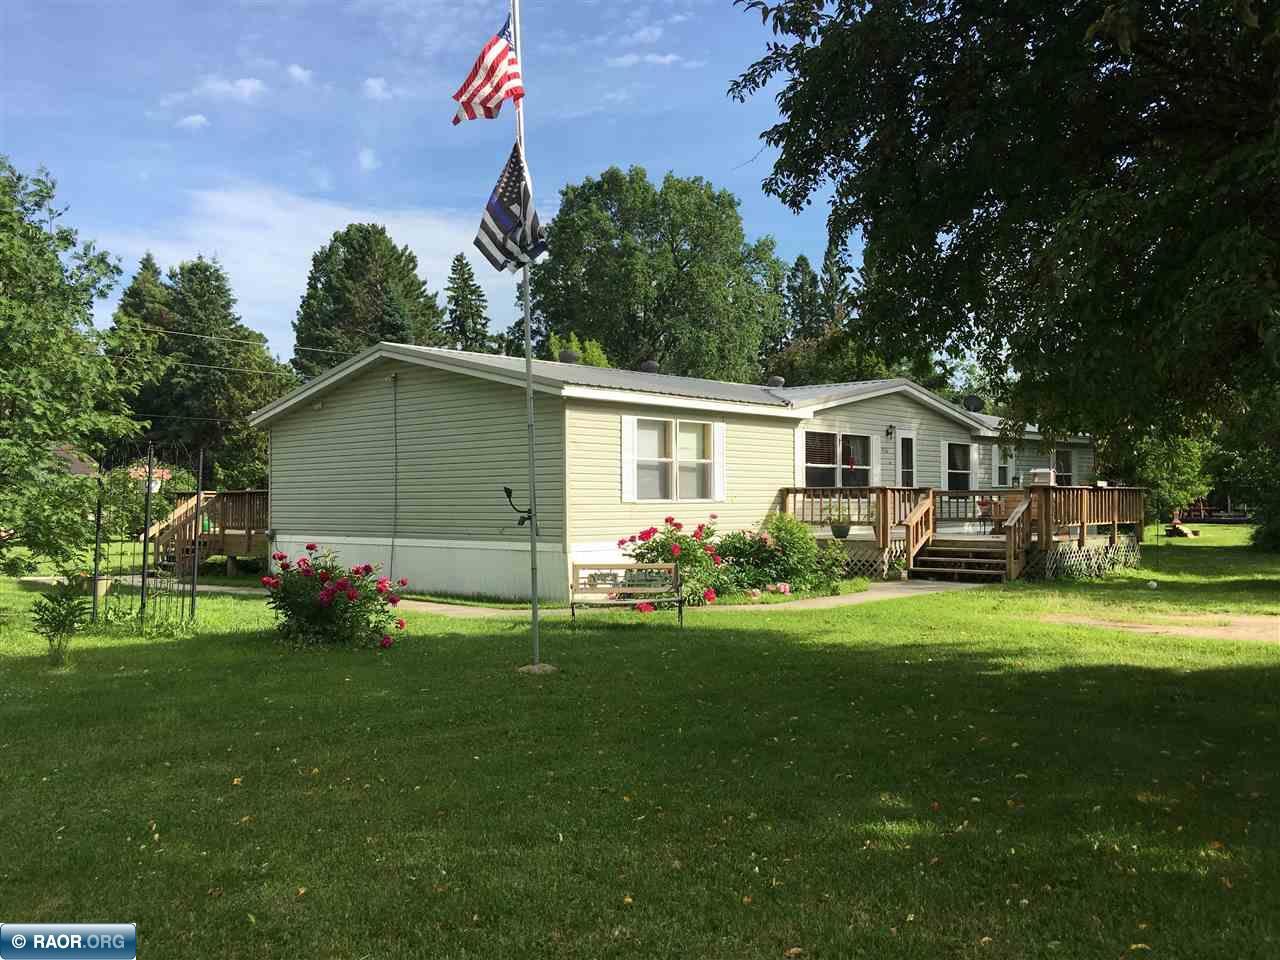 712 Spruce St, LittleFork, MN 56653